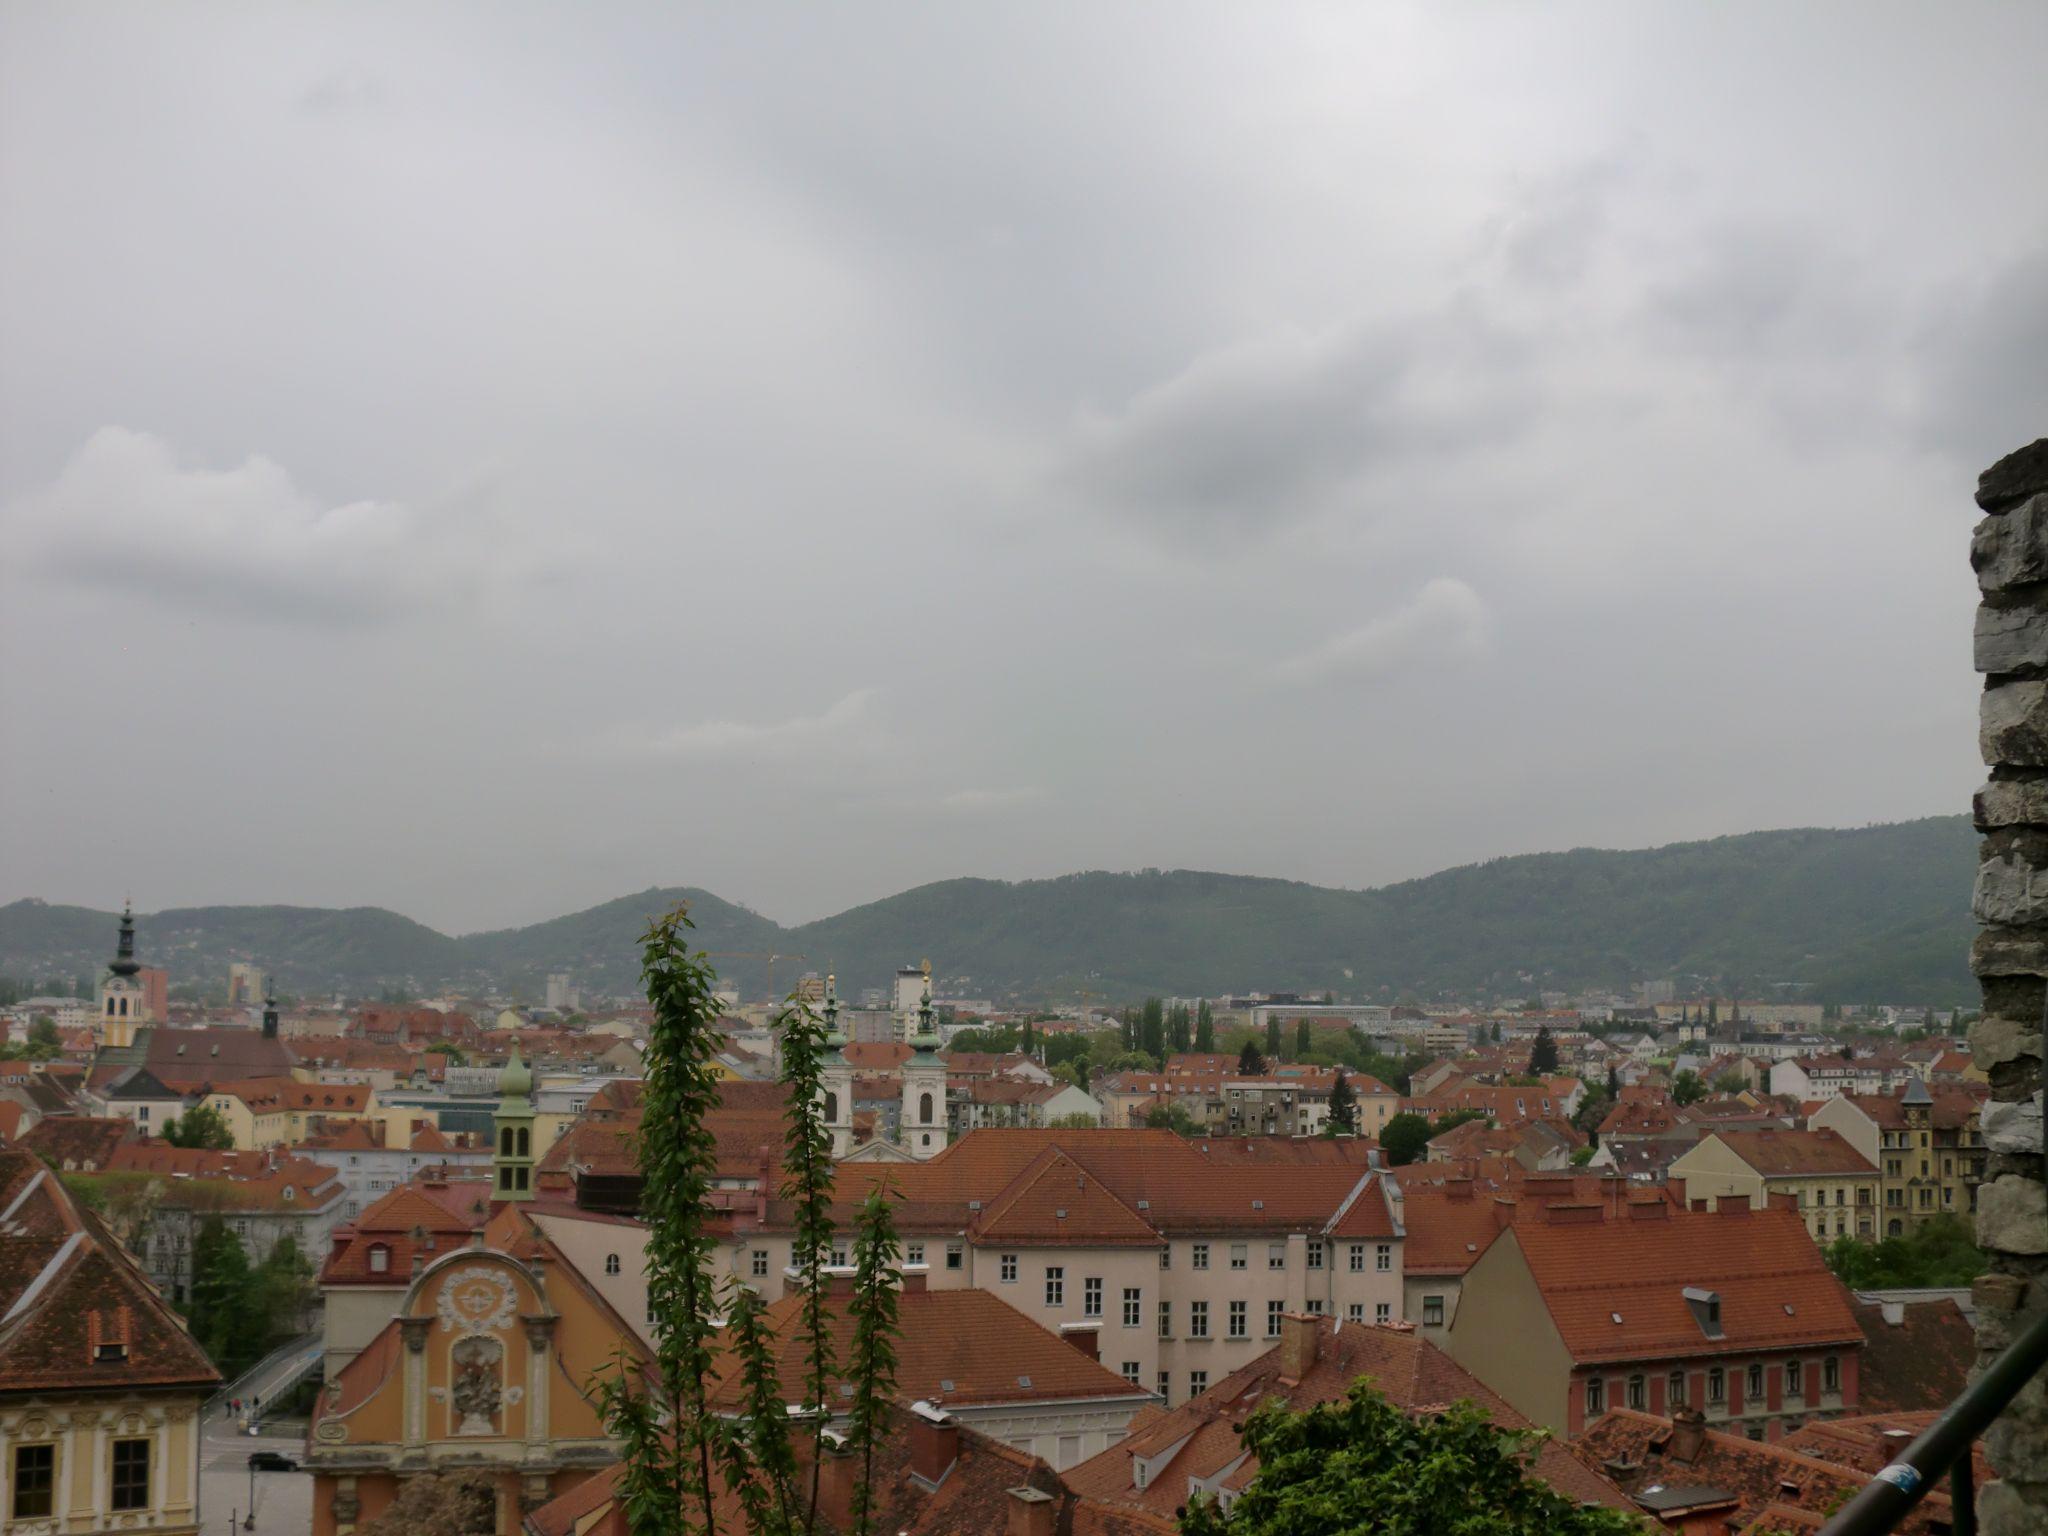 Graz view 2 - Graz: tradition and modernity